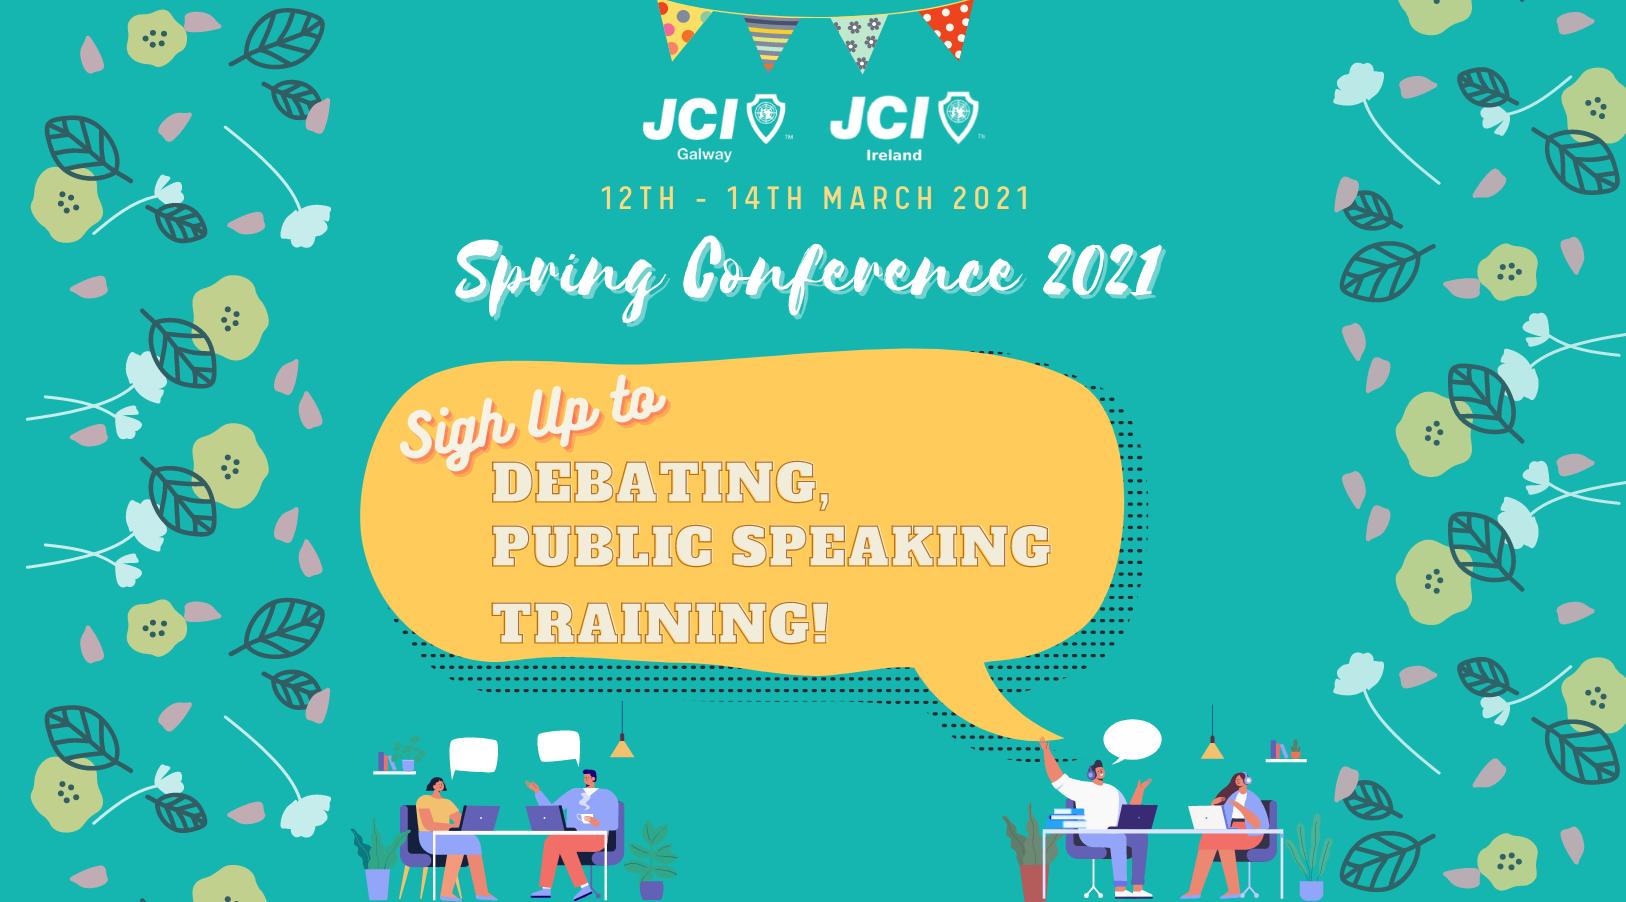 JCI Ireland Spring Conference 2021